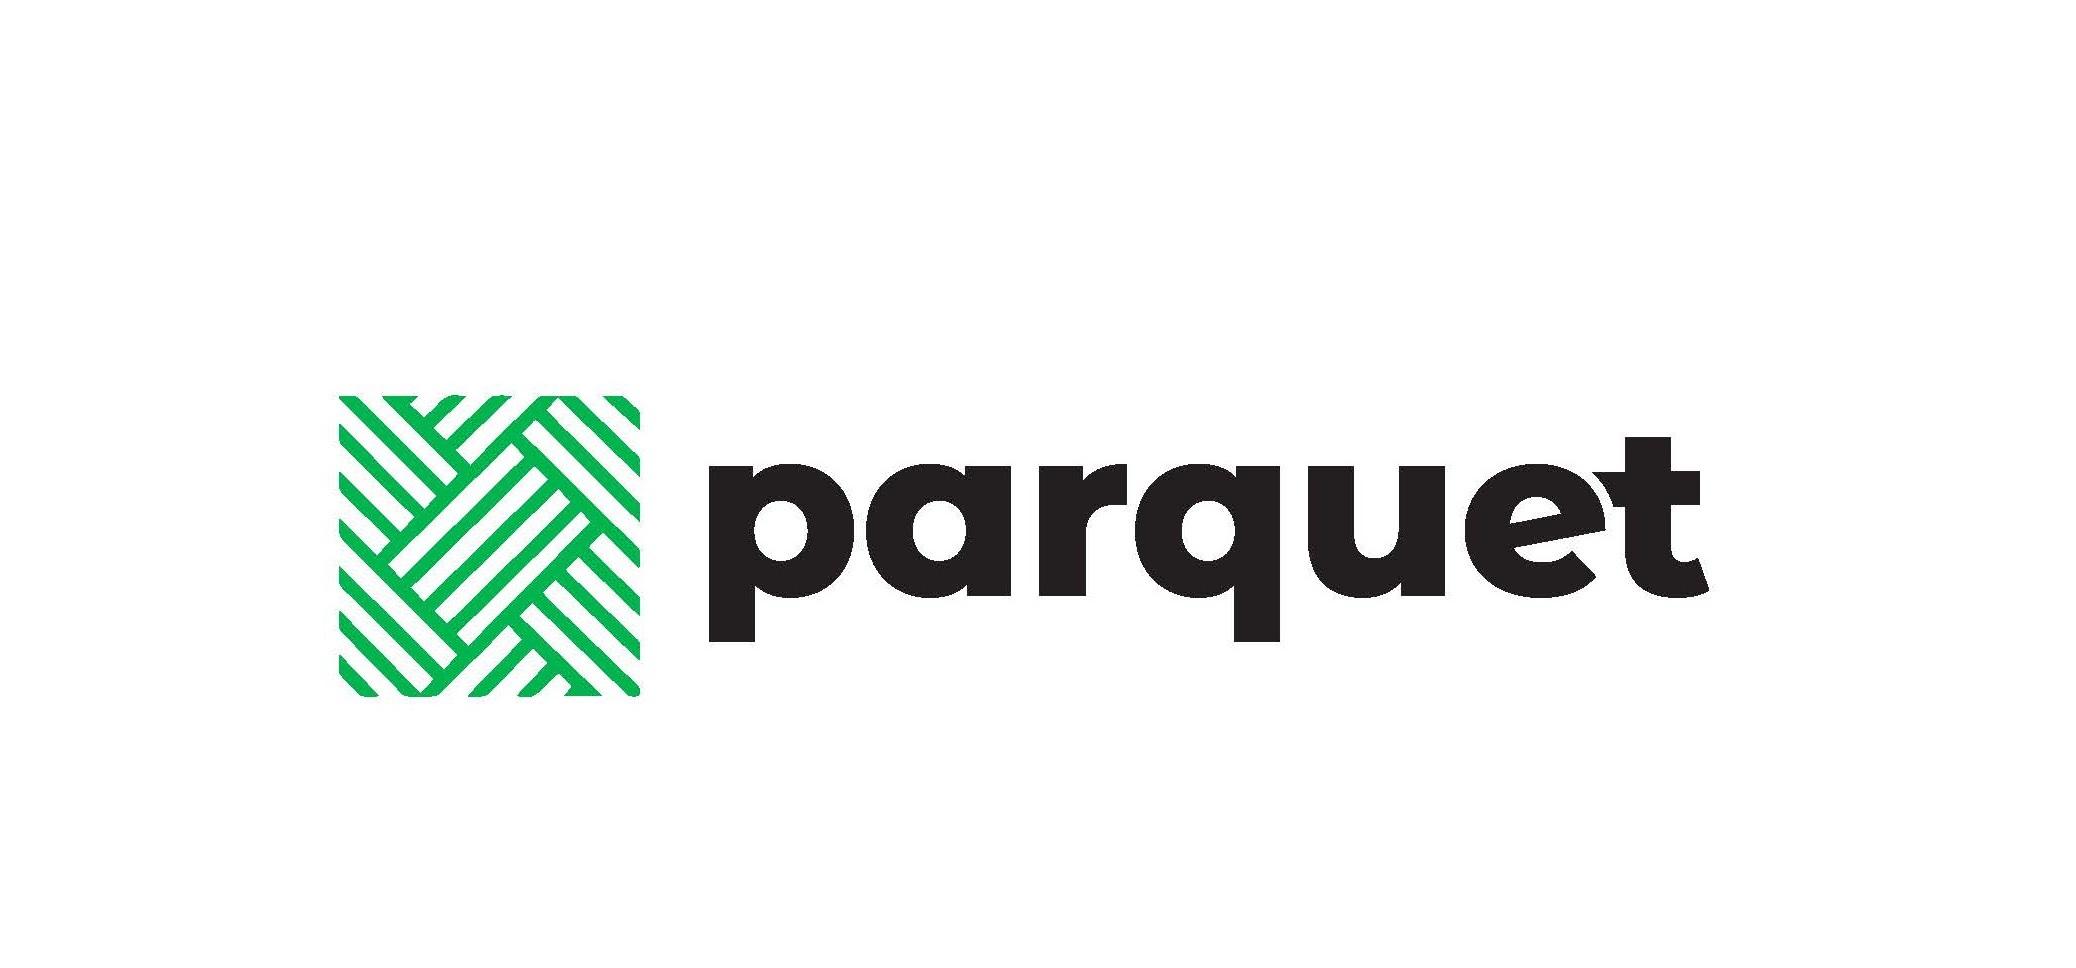 Parquet Capital Logo